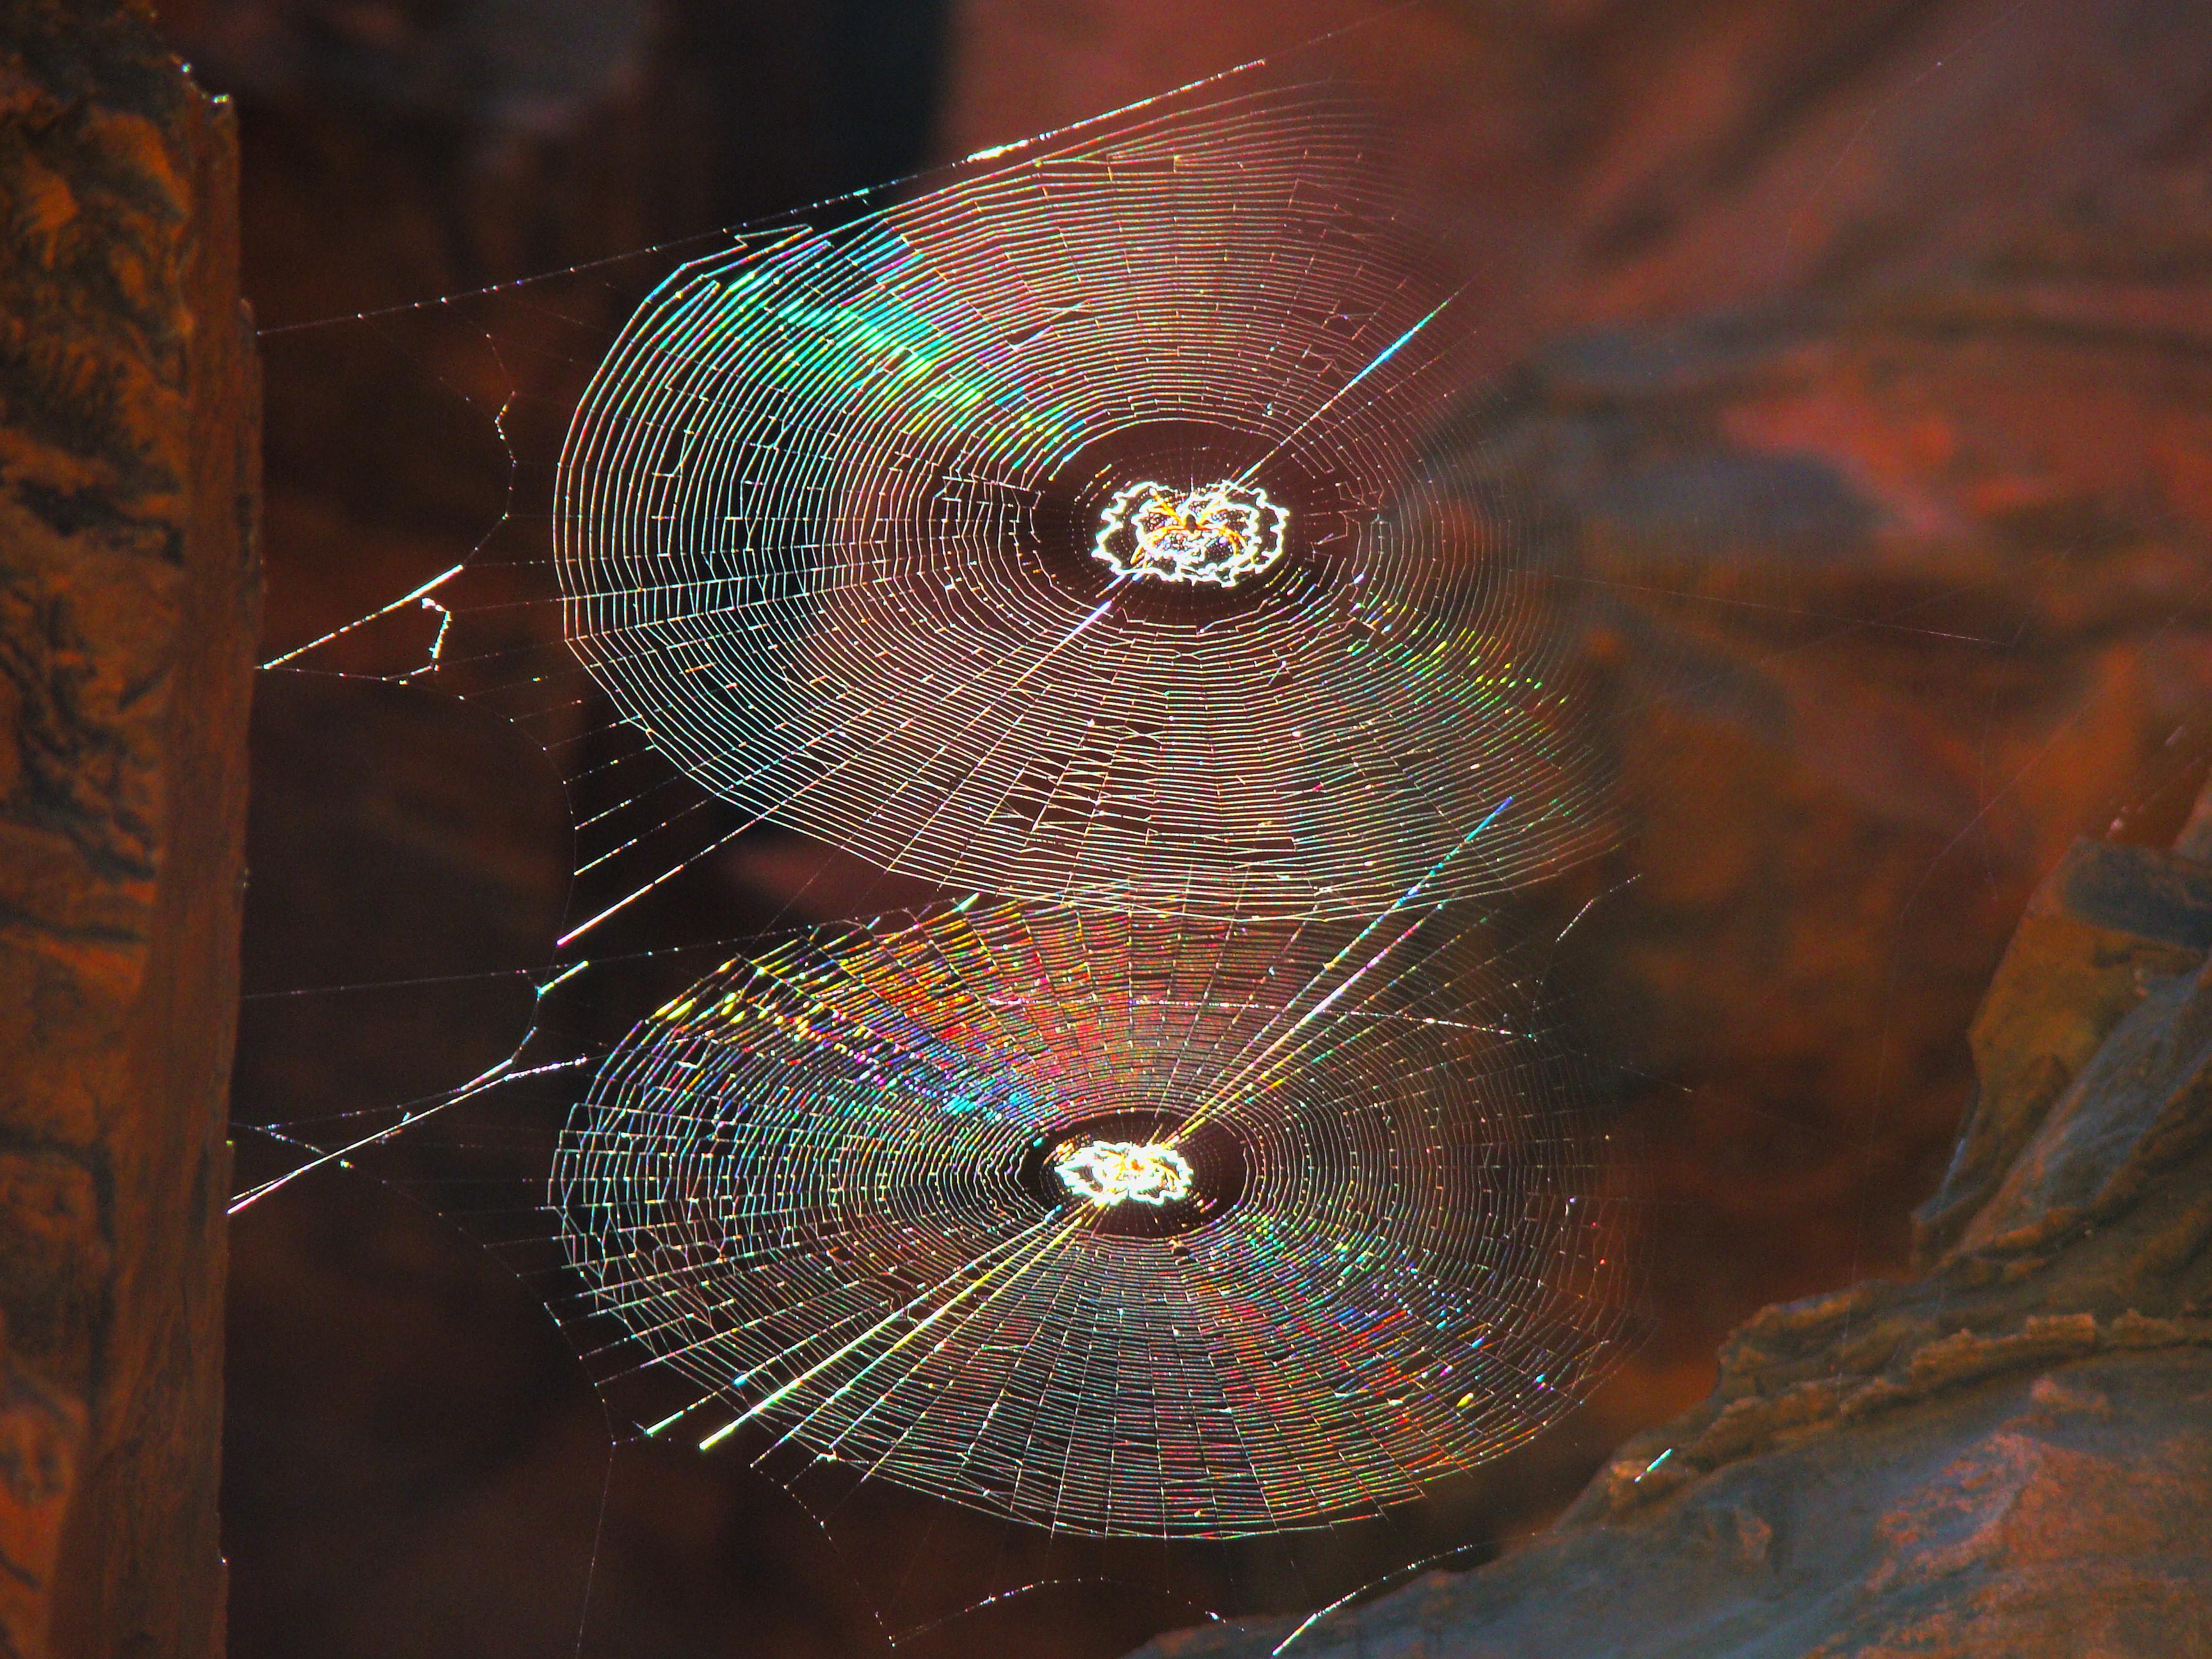 Pajaki chandelier a traditional polish springtime craft spiralorbwebs arubaitofo Choice Image